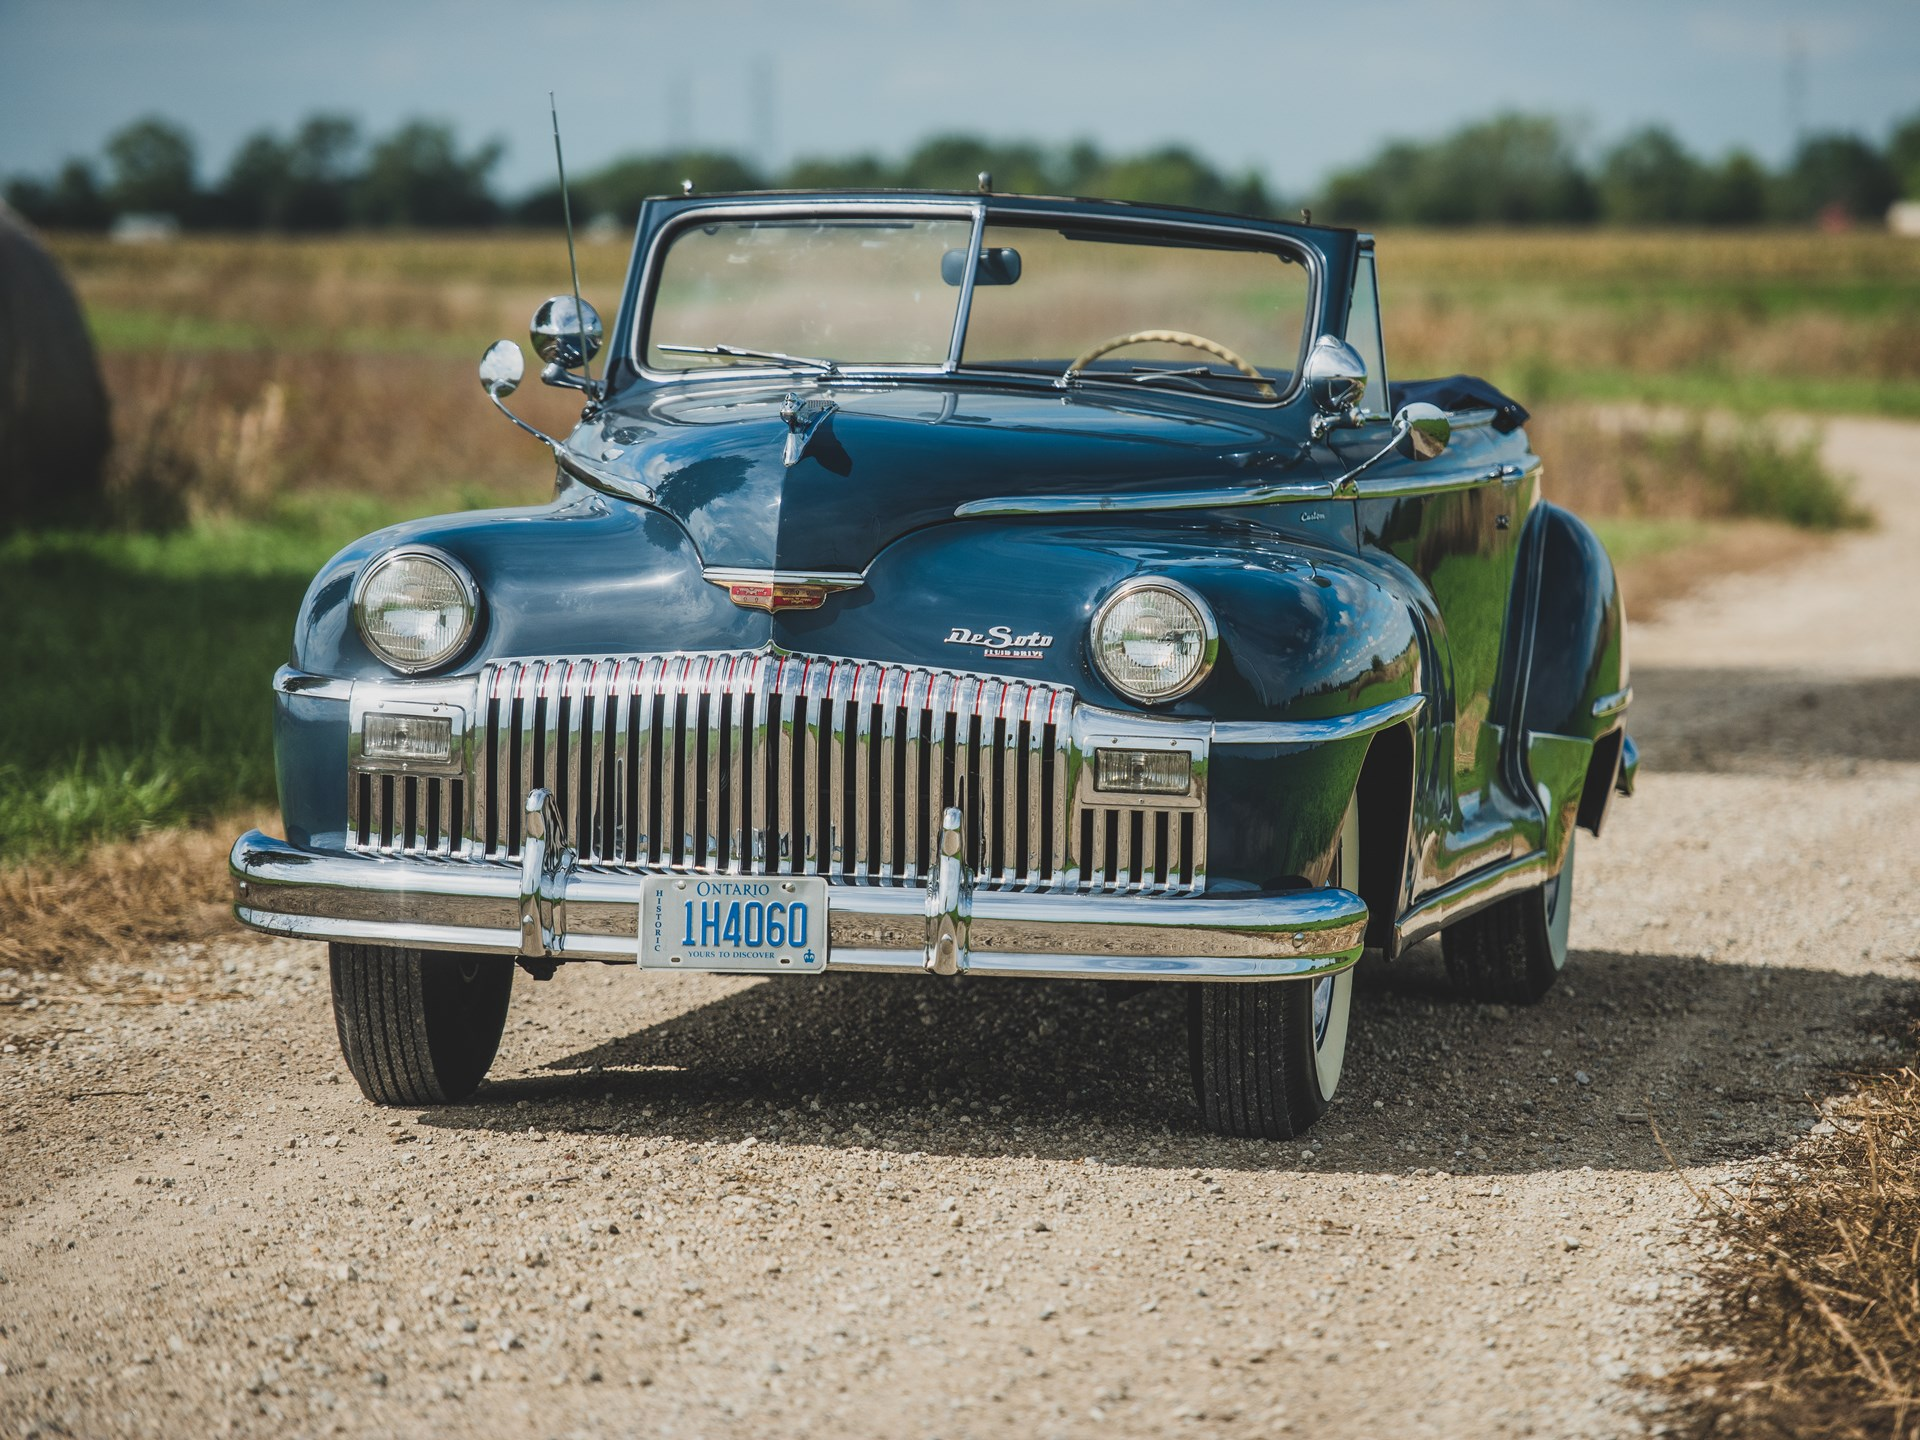 1942 Desoto Convertible Chrysler New Yorker Rm Sothebys Custom Hershey 1920x1440